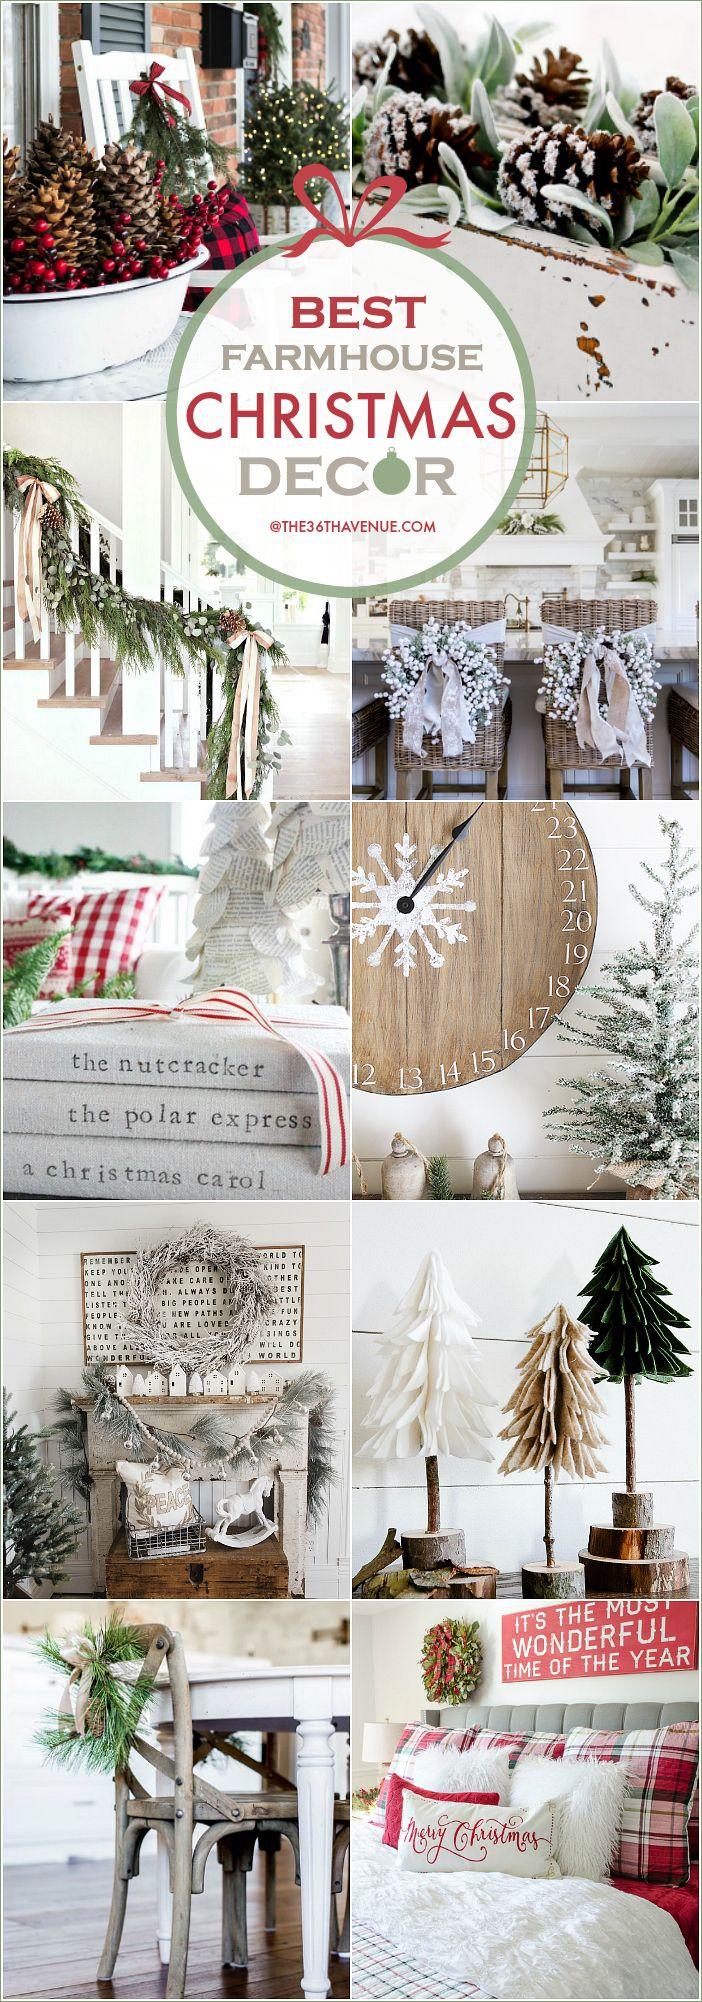 Farmhouse Christmas Decor Ideas. Beautiful Christmas decorations for your home.